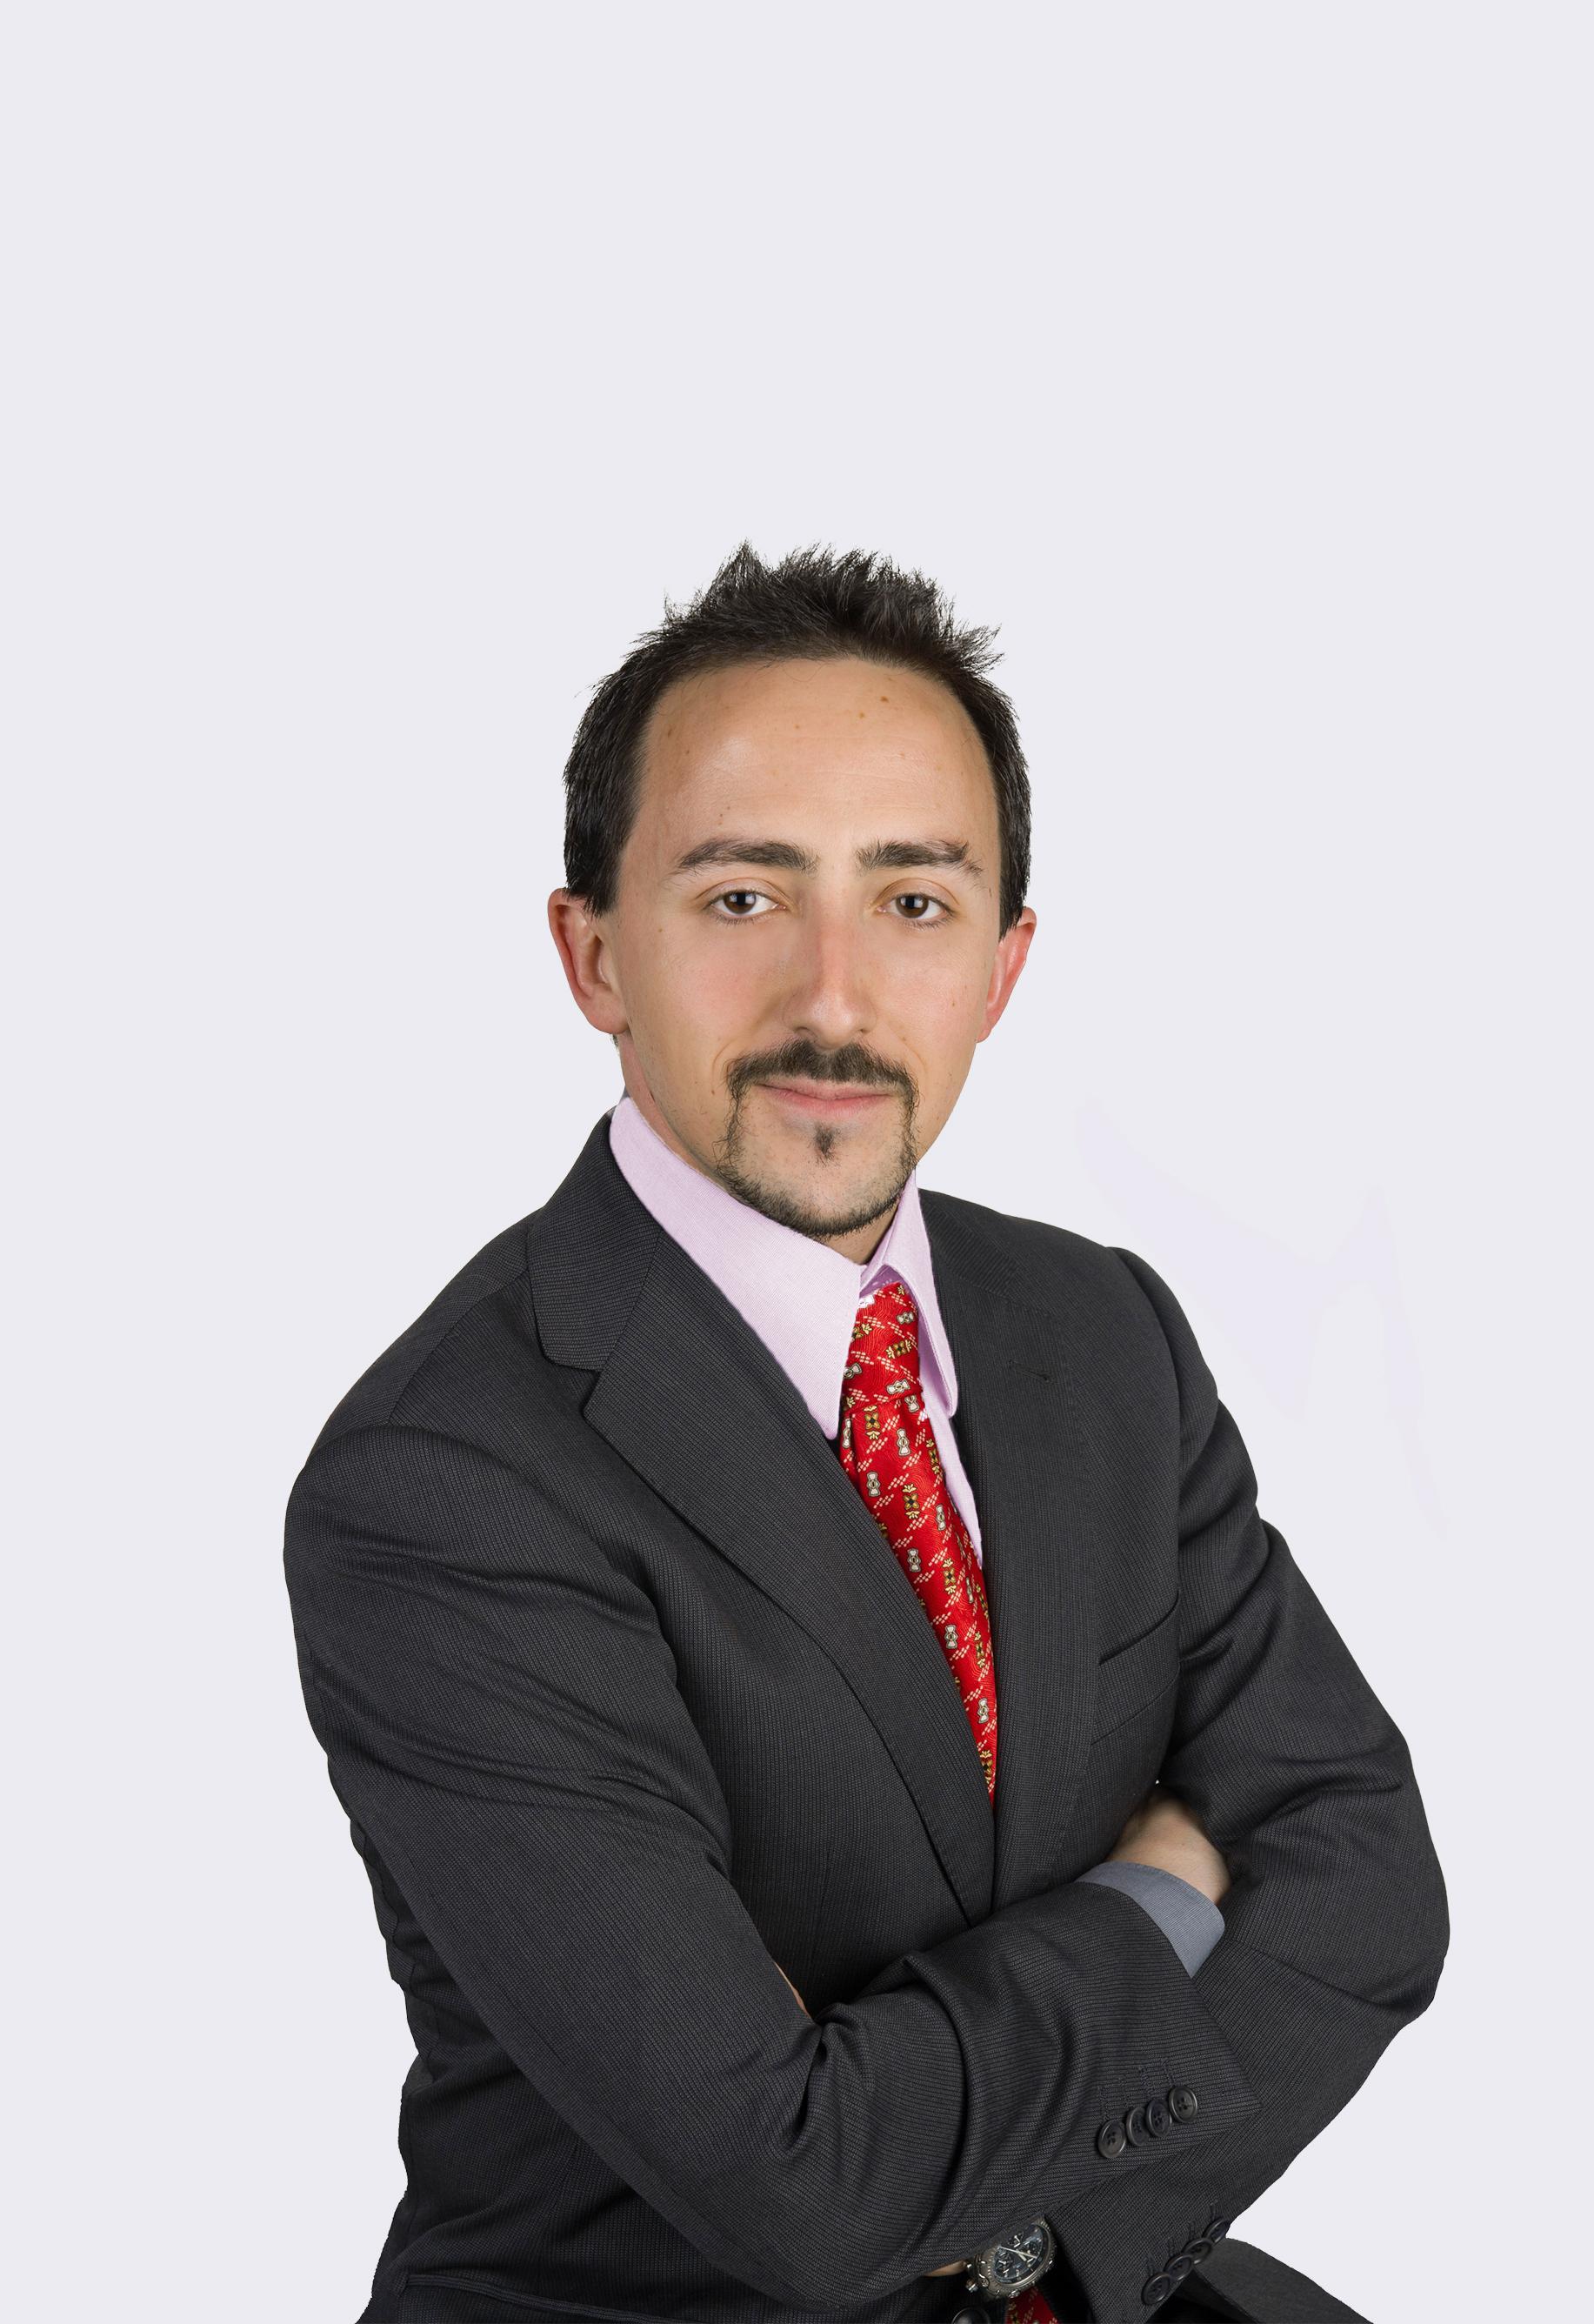 Jorge Lamela